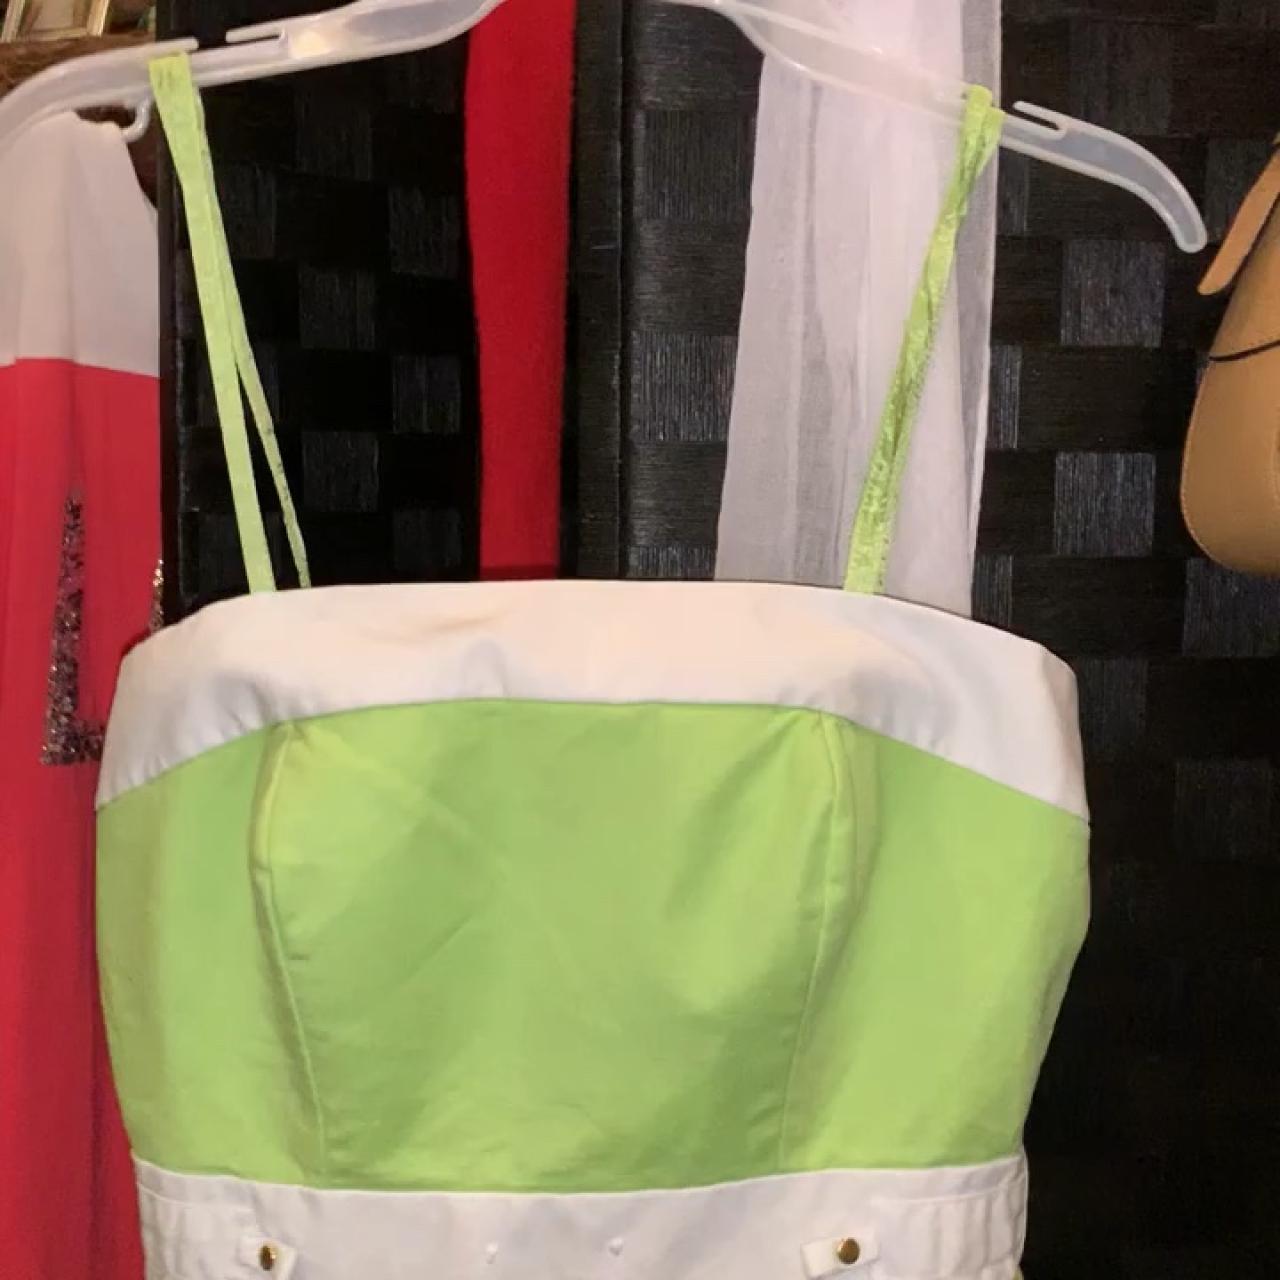 ce4d00b74b7 Green and white strapless dress the brand is Antonio Melani - Depop